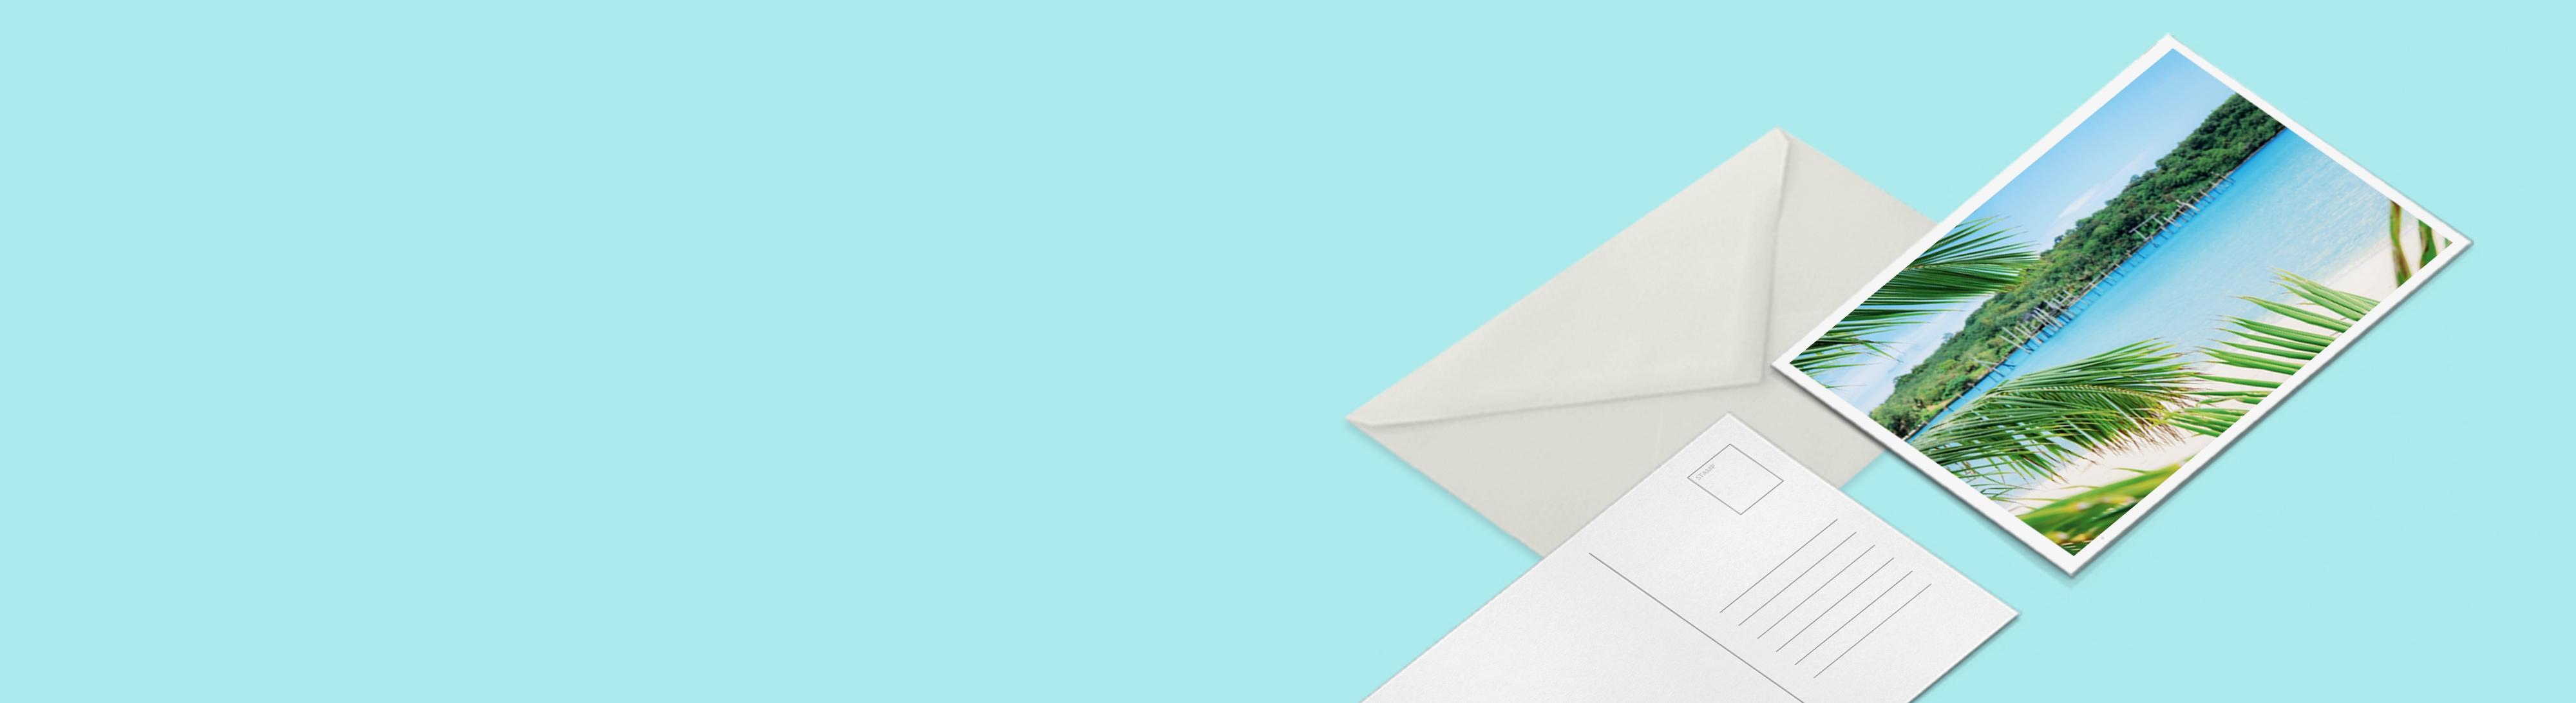 Imprimer carte postale standard personnalisée